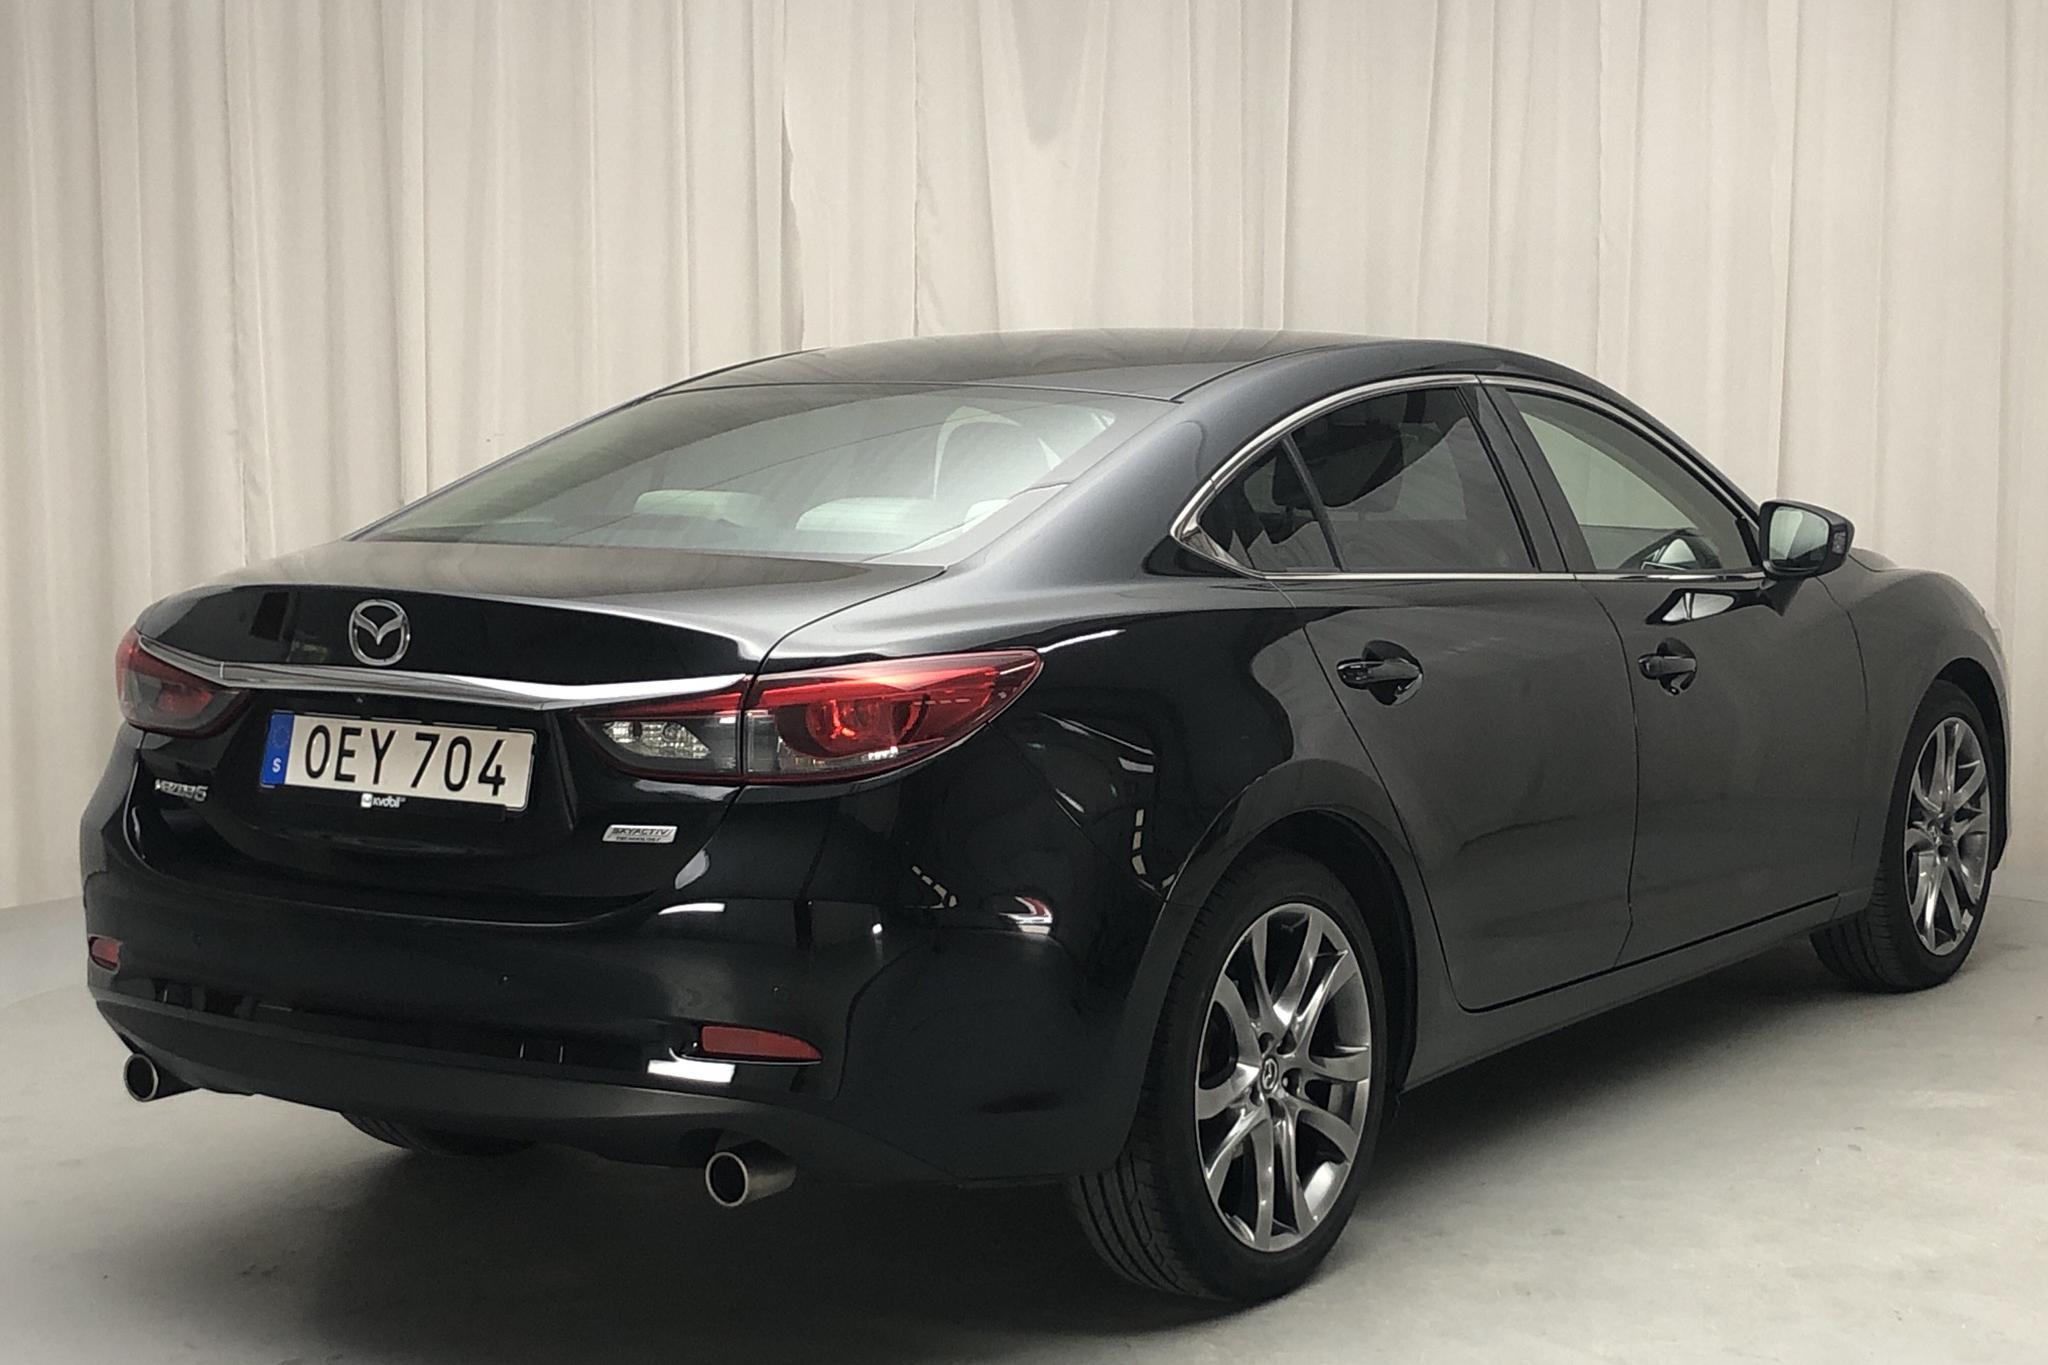 Mazda 6 2.5 Sedan (192hk) - 7 244 mil - Automat - svart - 2016